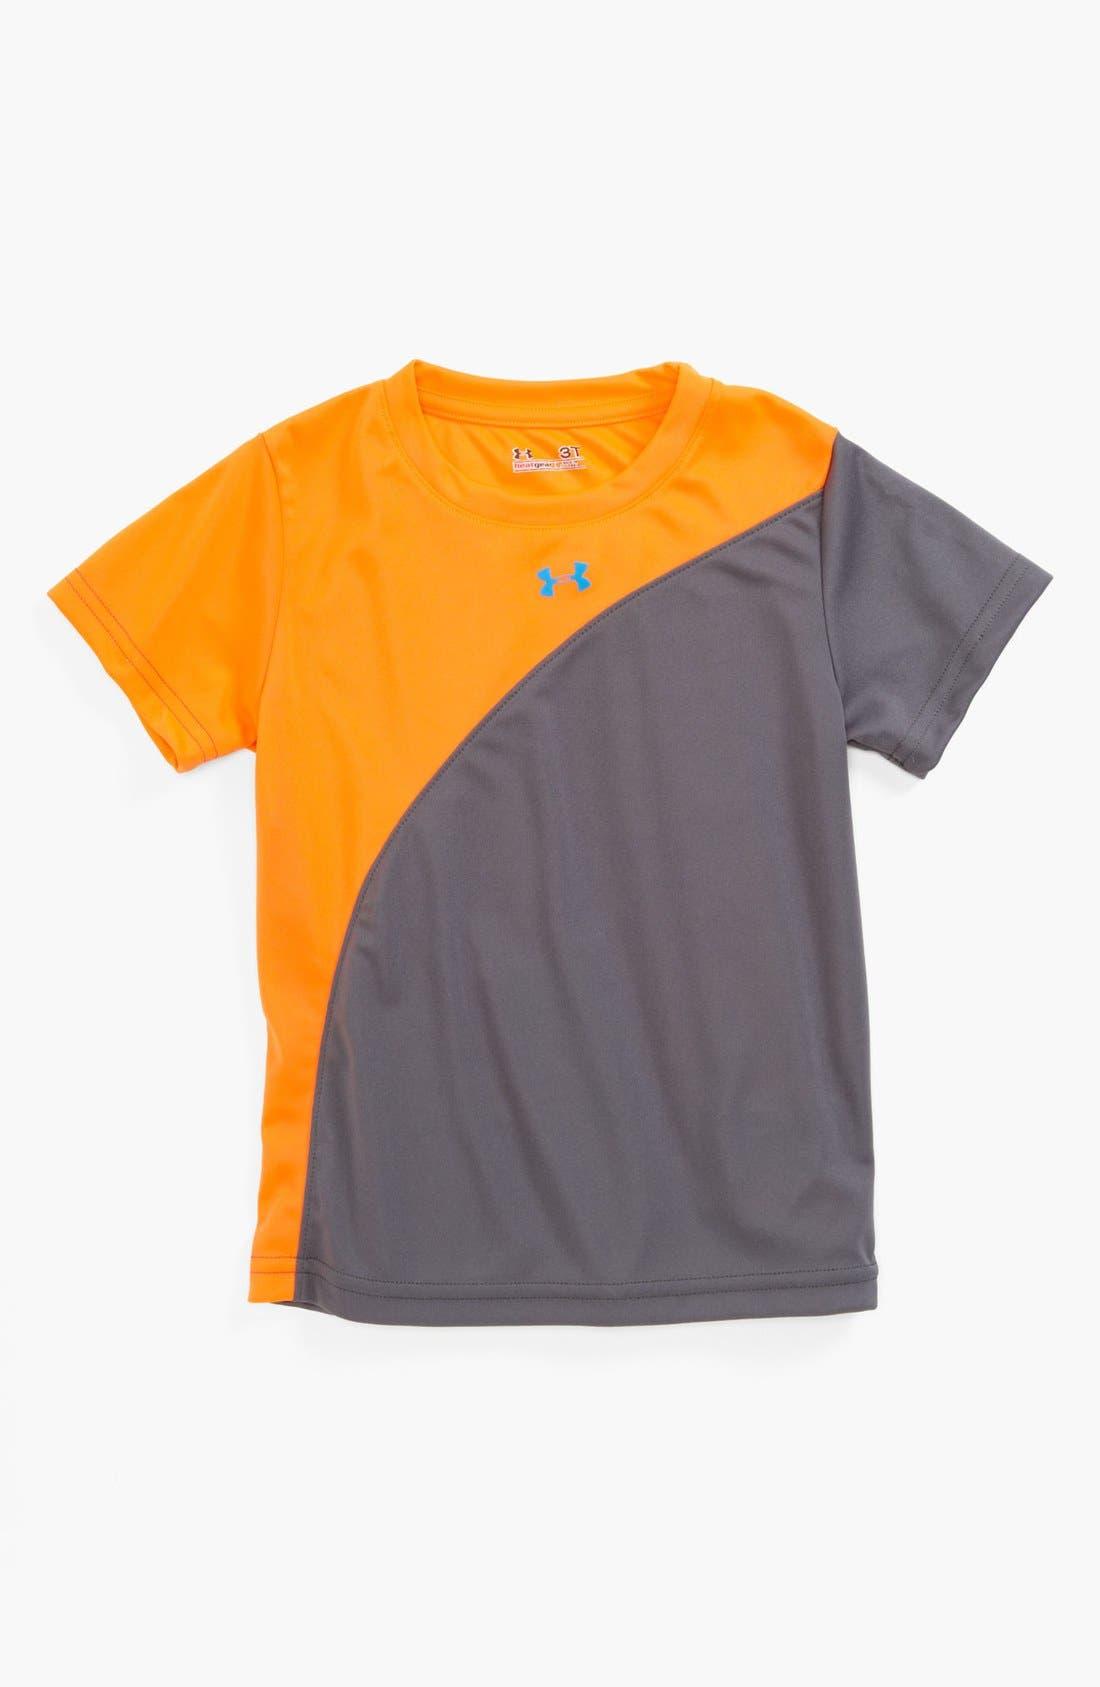 Main Image - Under Armour 'Flip' T-Shirt (Toddler)